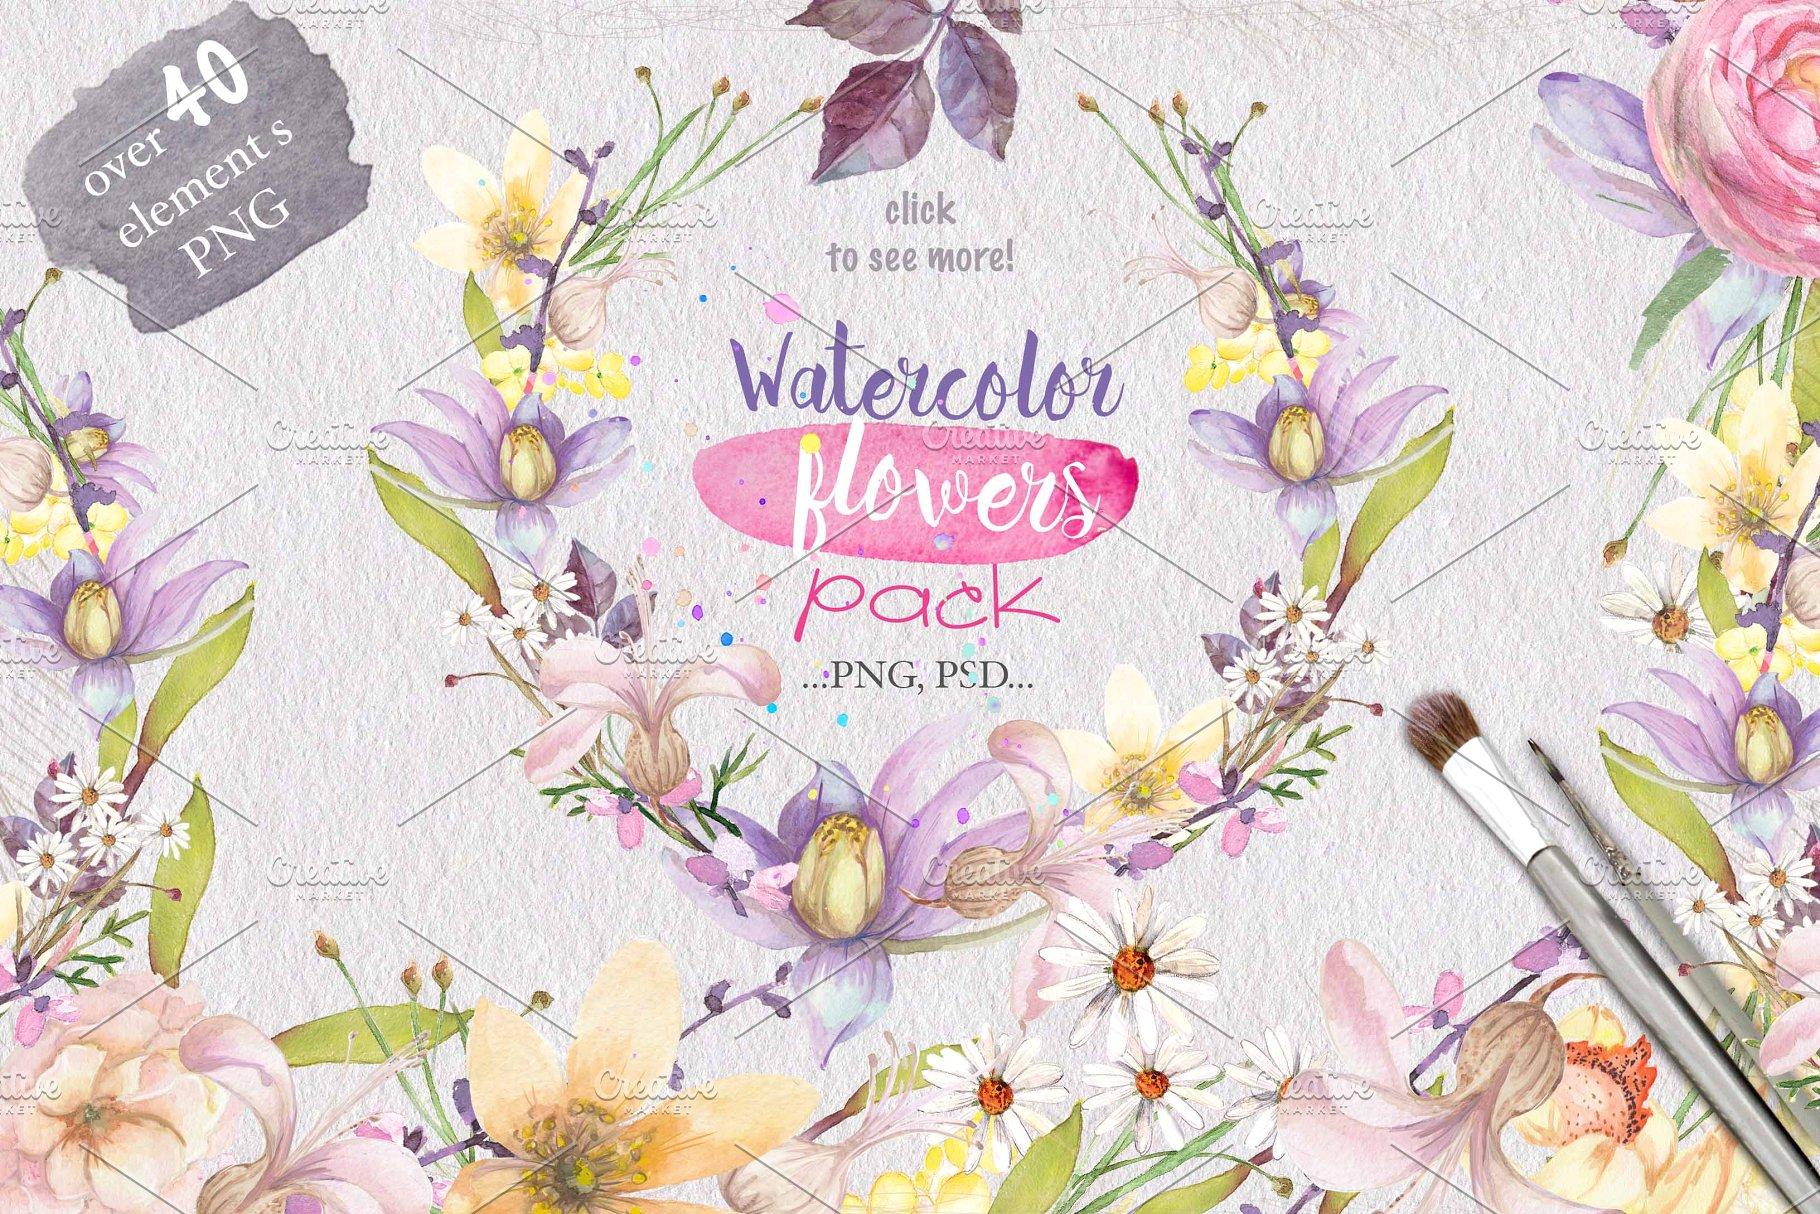 watercolo-flower-pack-2-.jpg